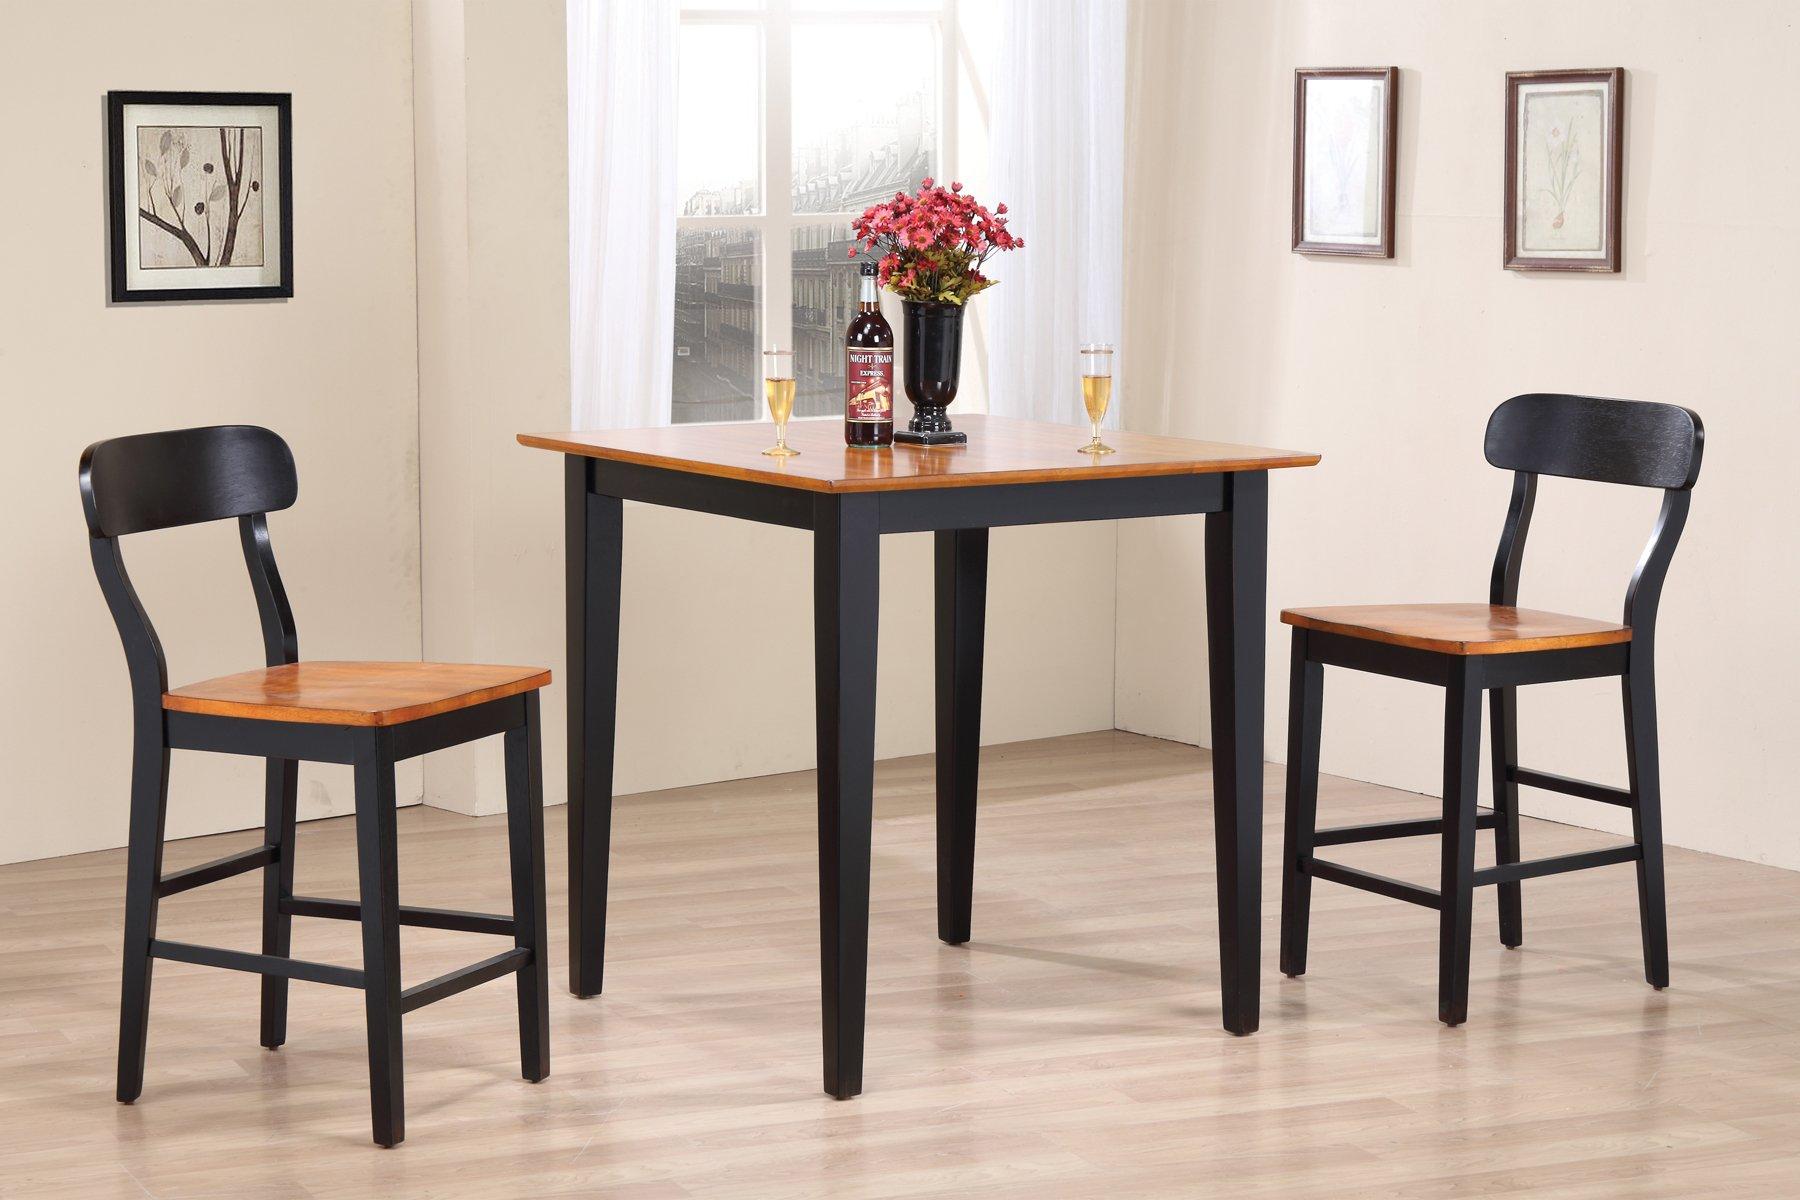 Dinette Sets Nashua Nh Furniture Store Mark S